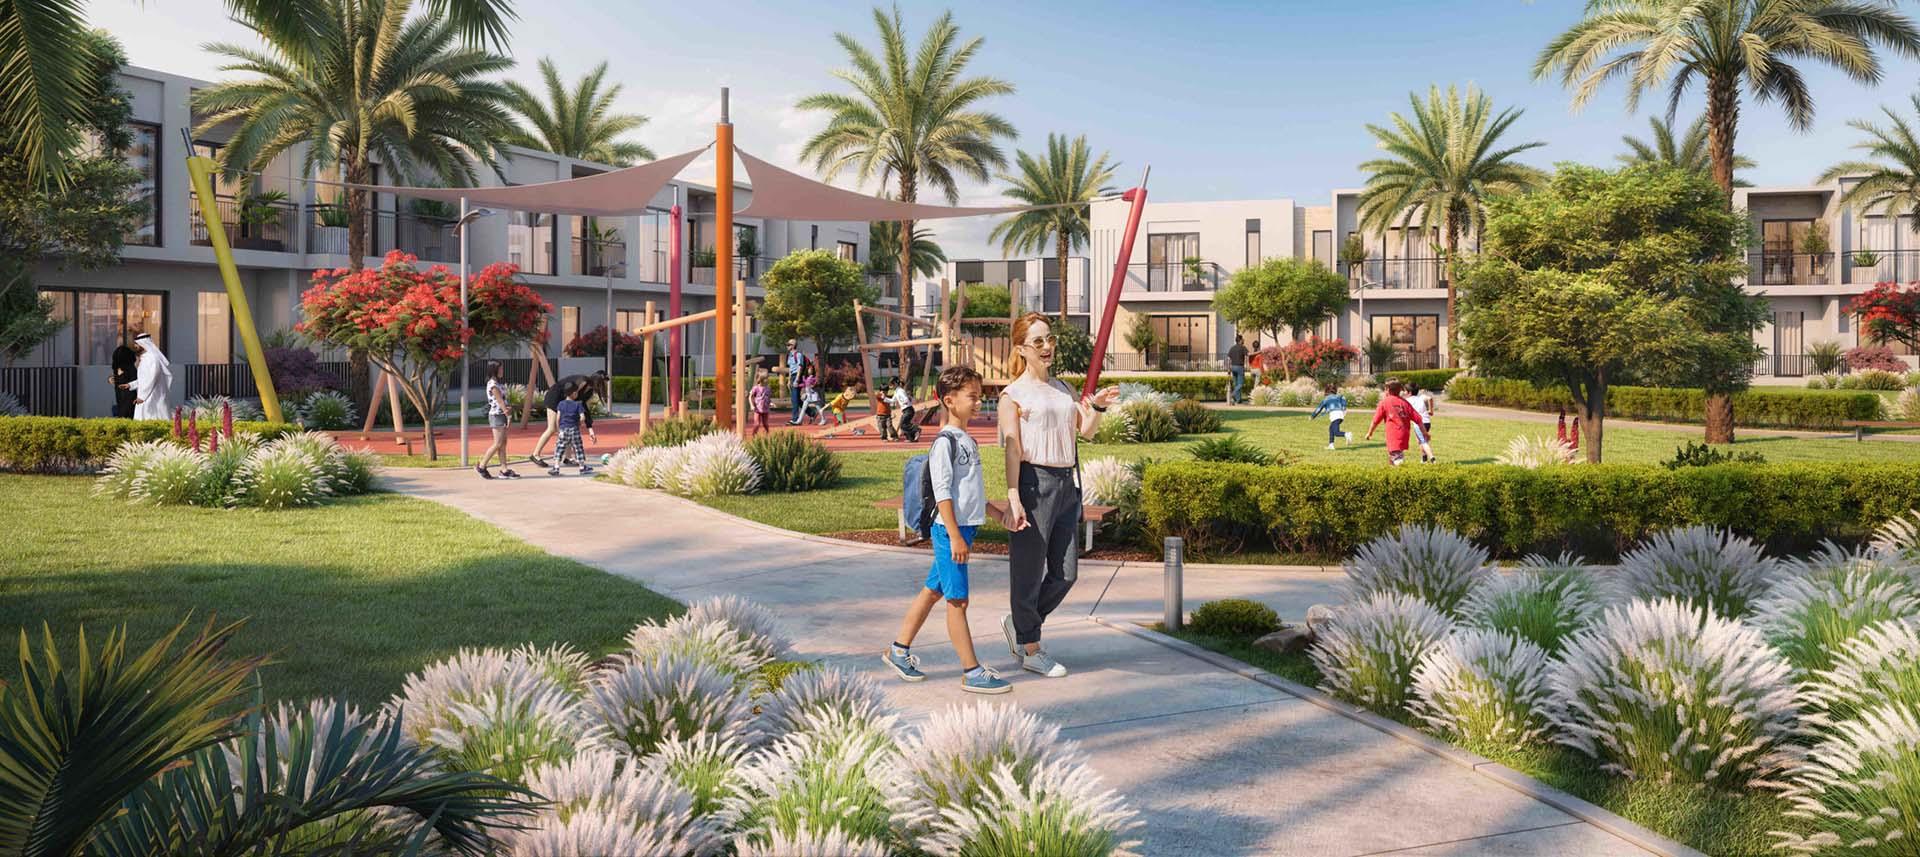 Expo Golf Villas in Emaar South by Emaar – Villas for Sale in Dubai